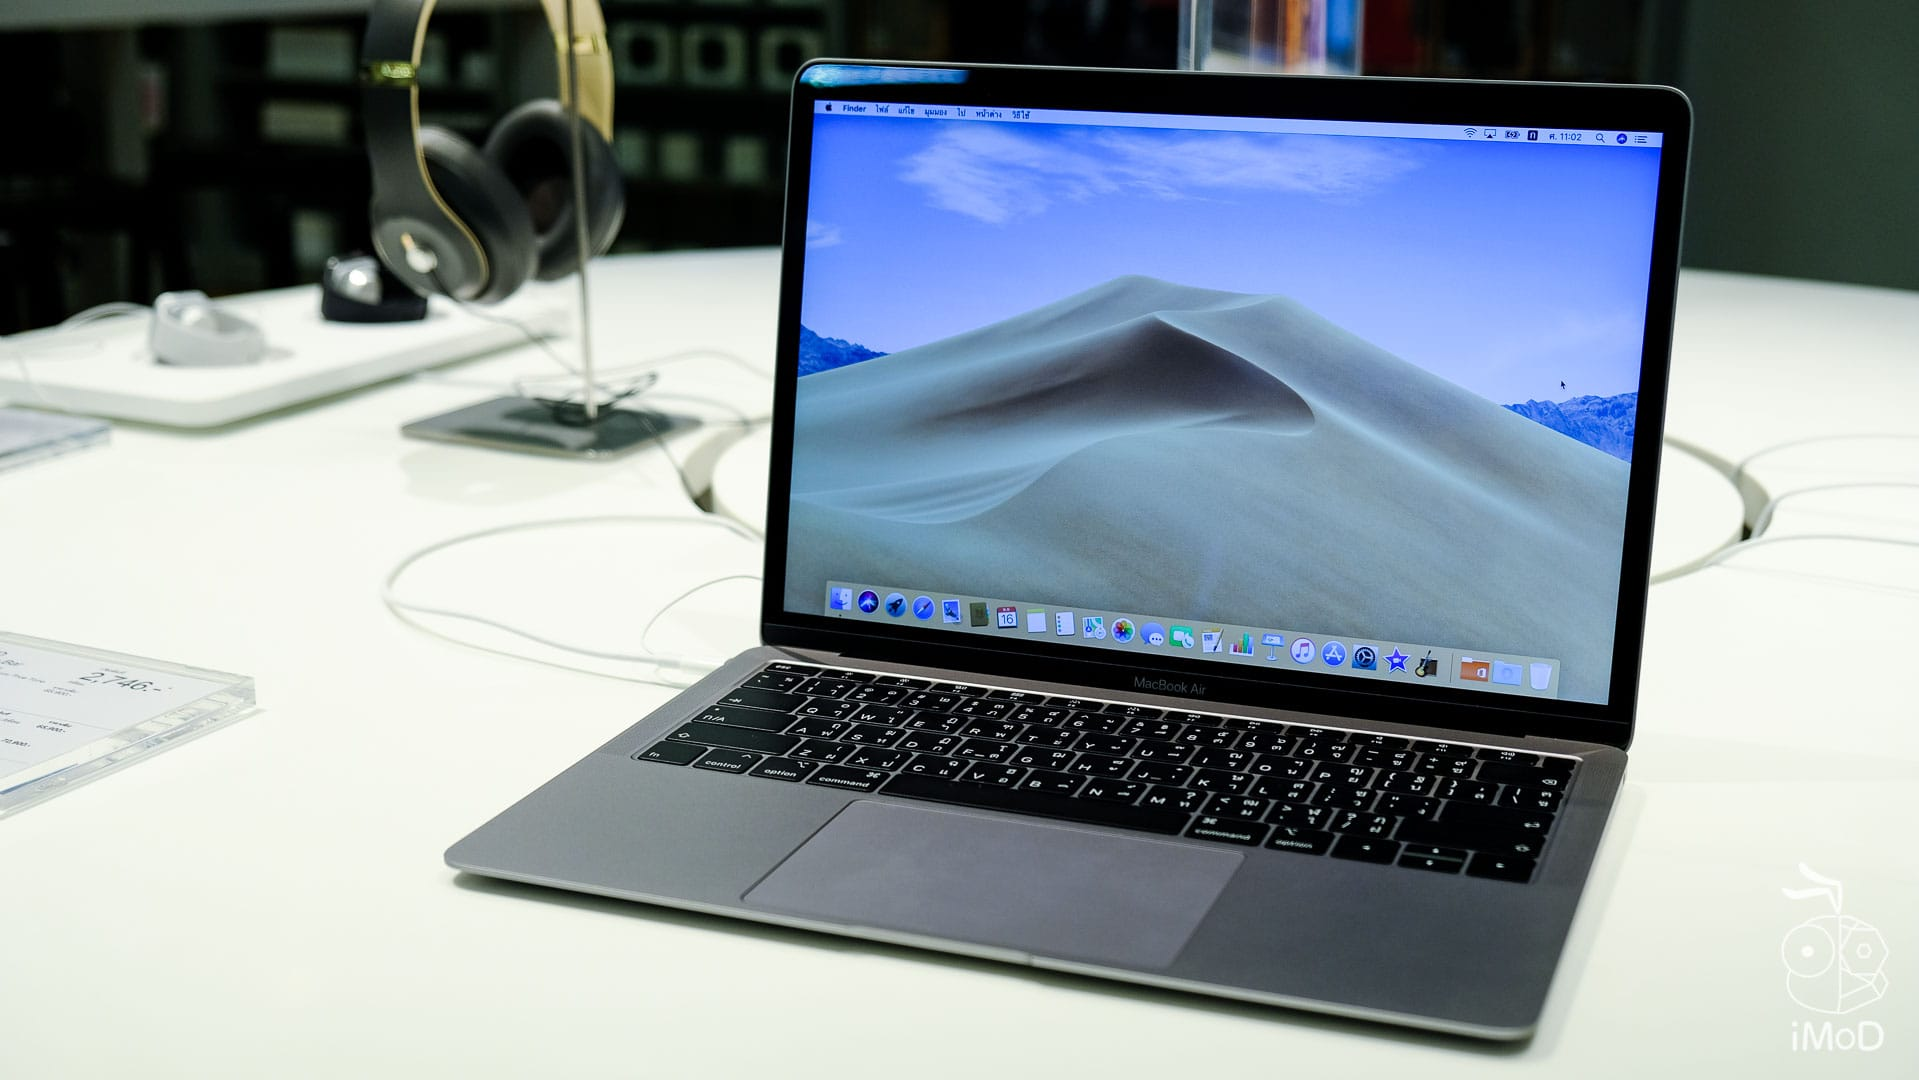 Ipad Pro Macbook Air 2018 Studio7 2354